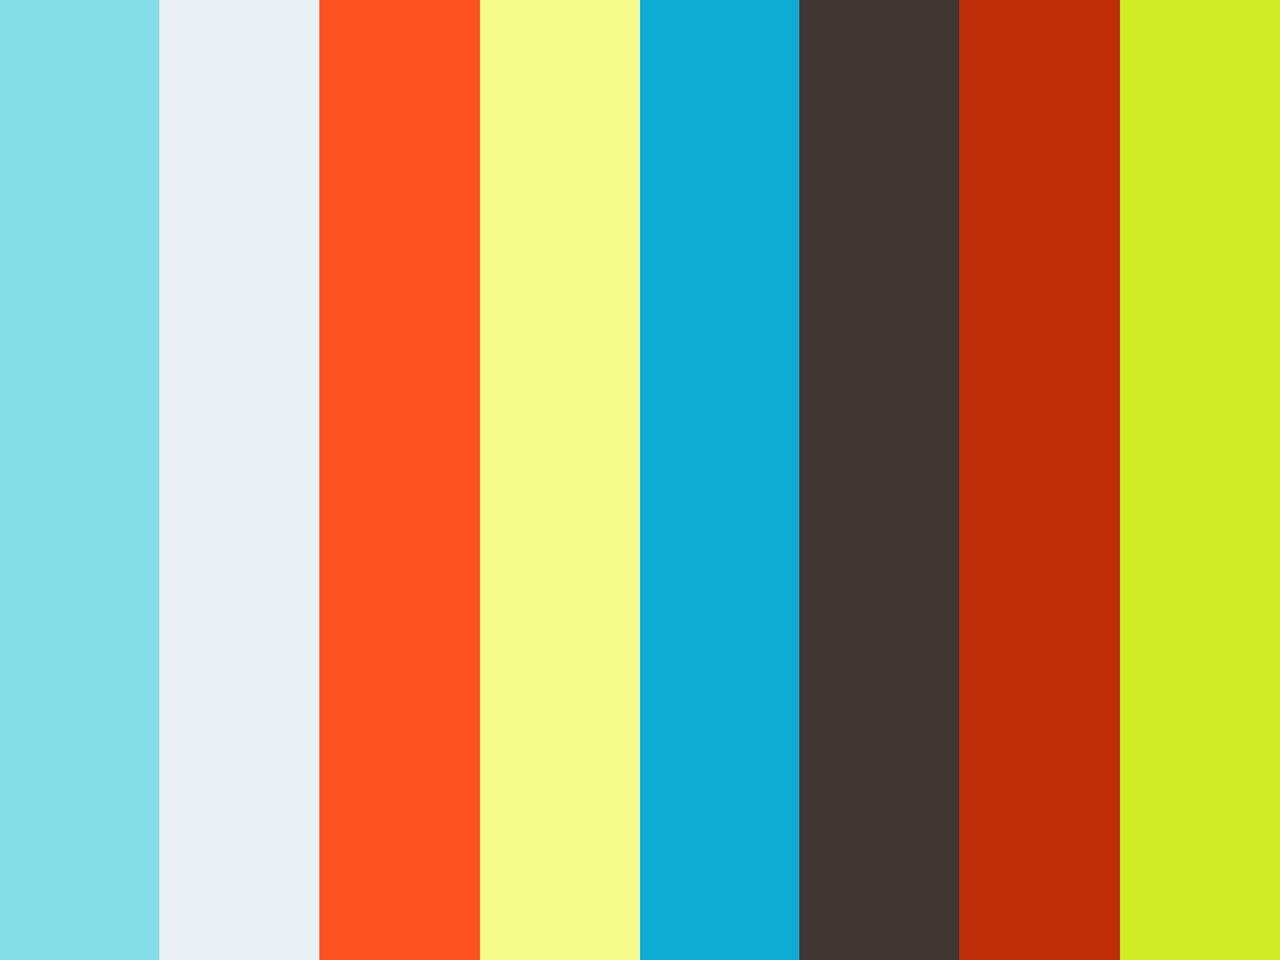 【SDE微電影】2015.05.02-琮賢 & 怡君︱愛情微電影︱當日快剪快播SDE︱高雄麗尊大酒店